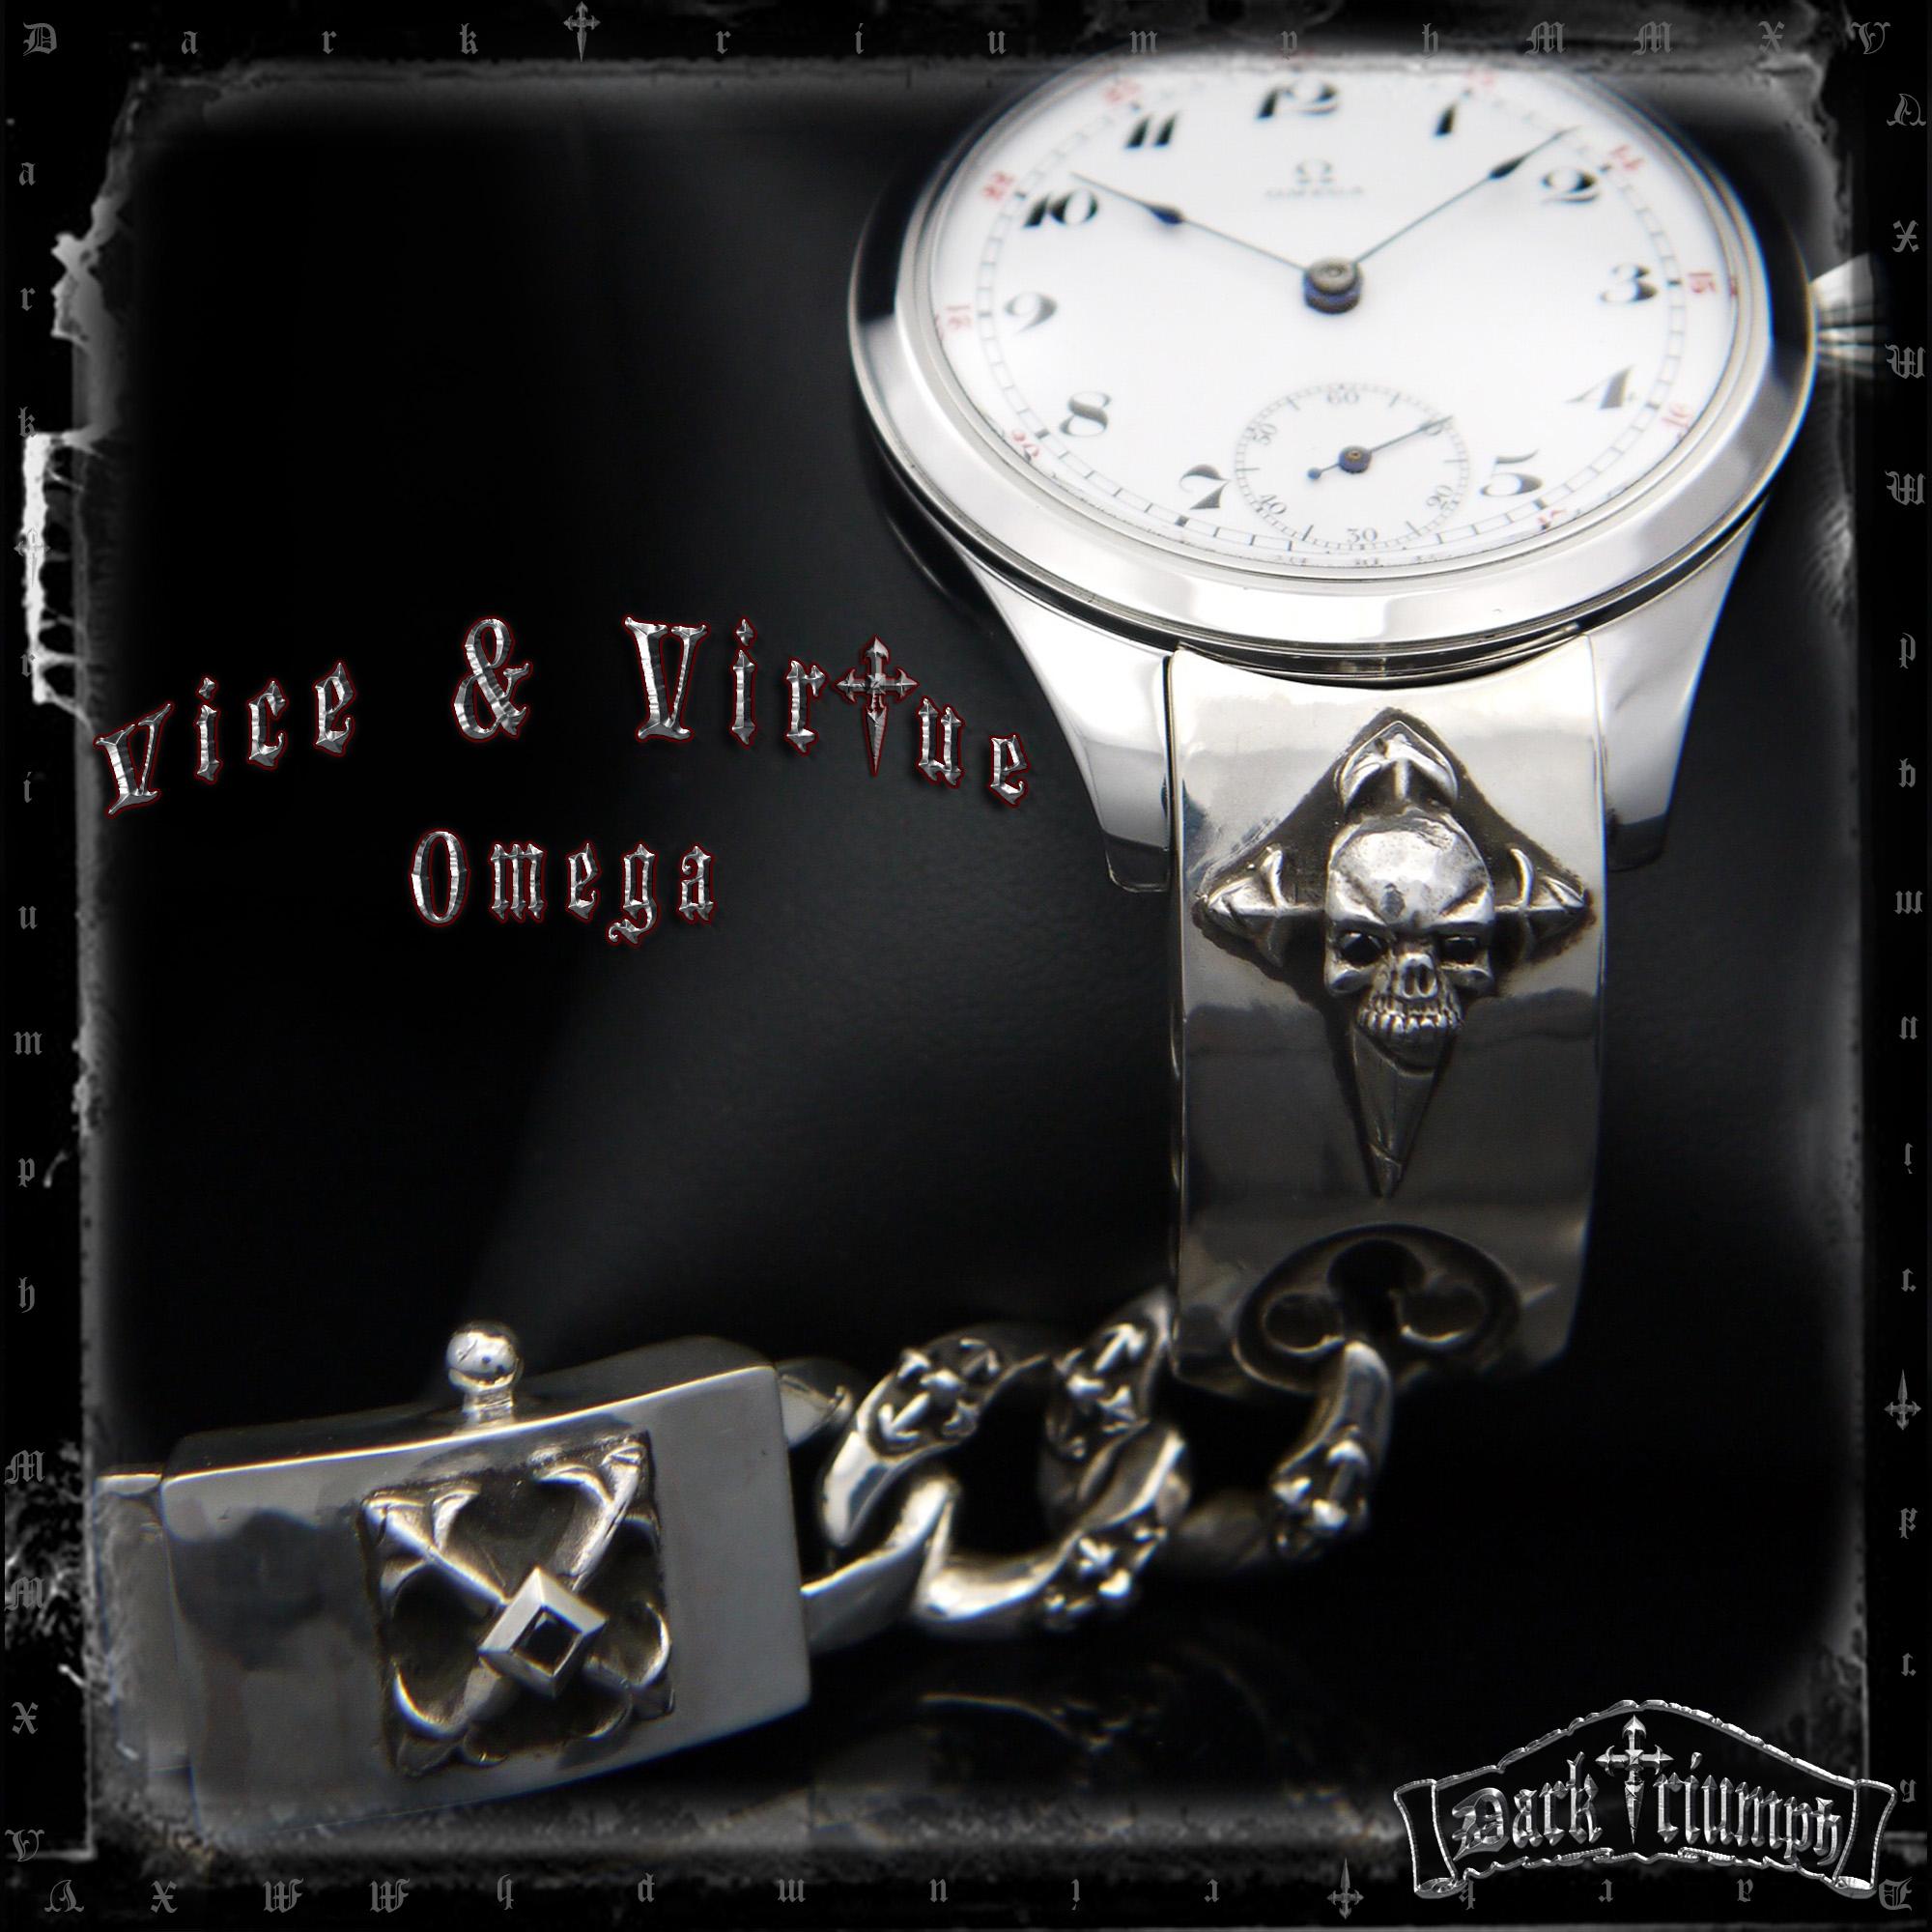 vice-virture-omega-titled.jpg